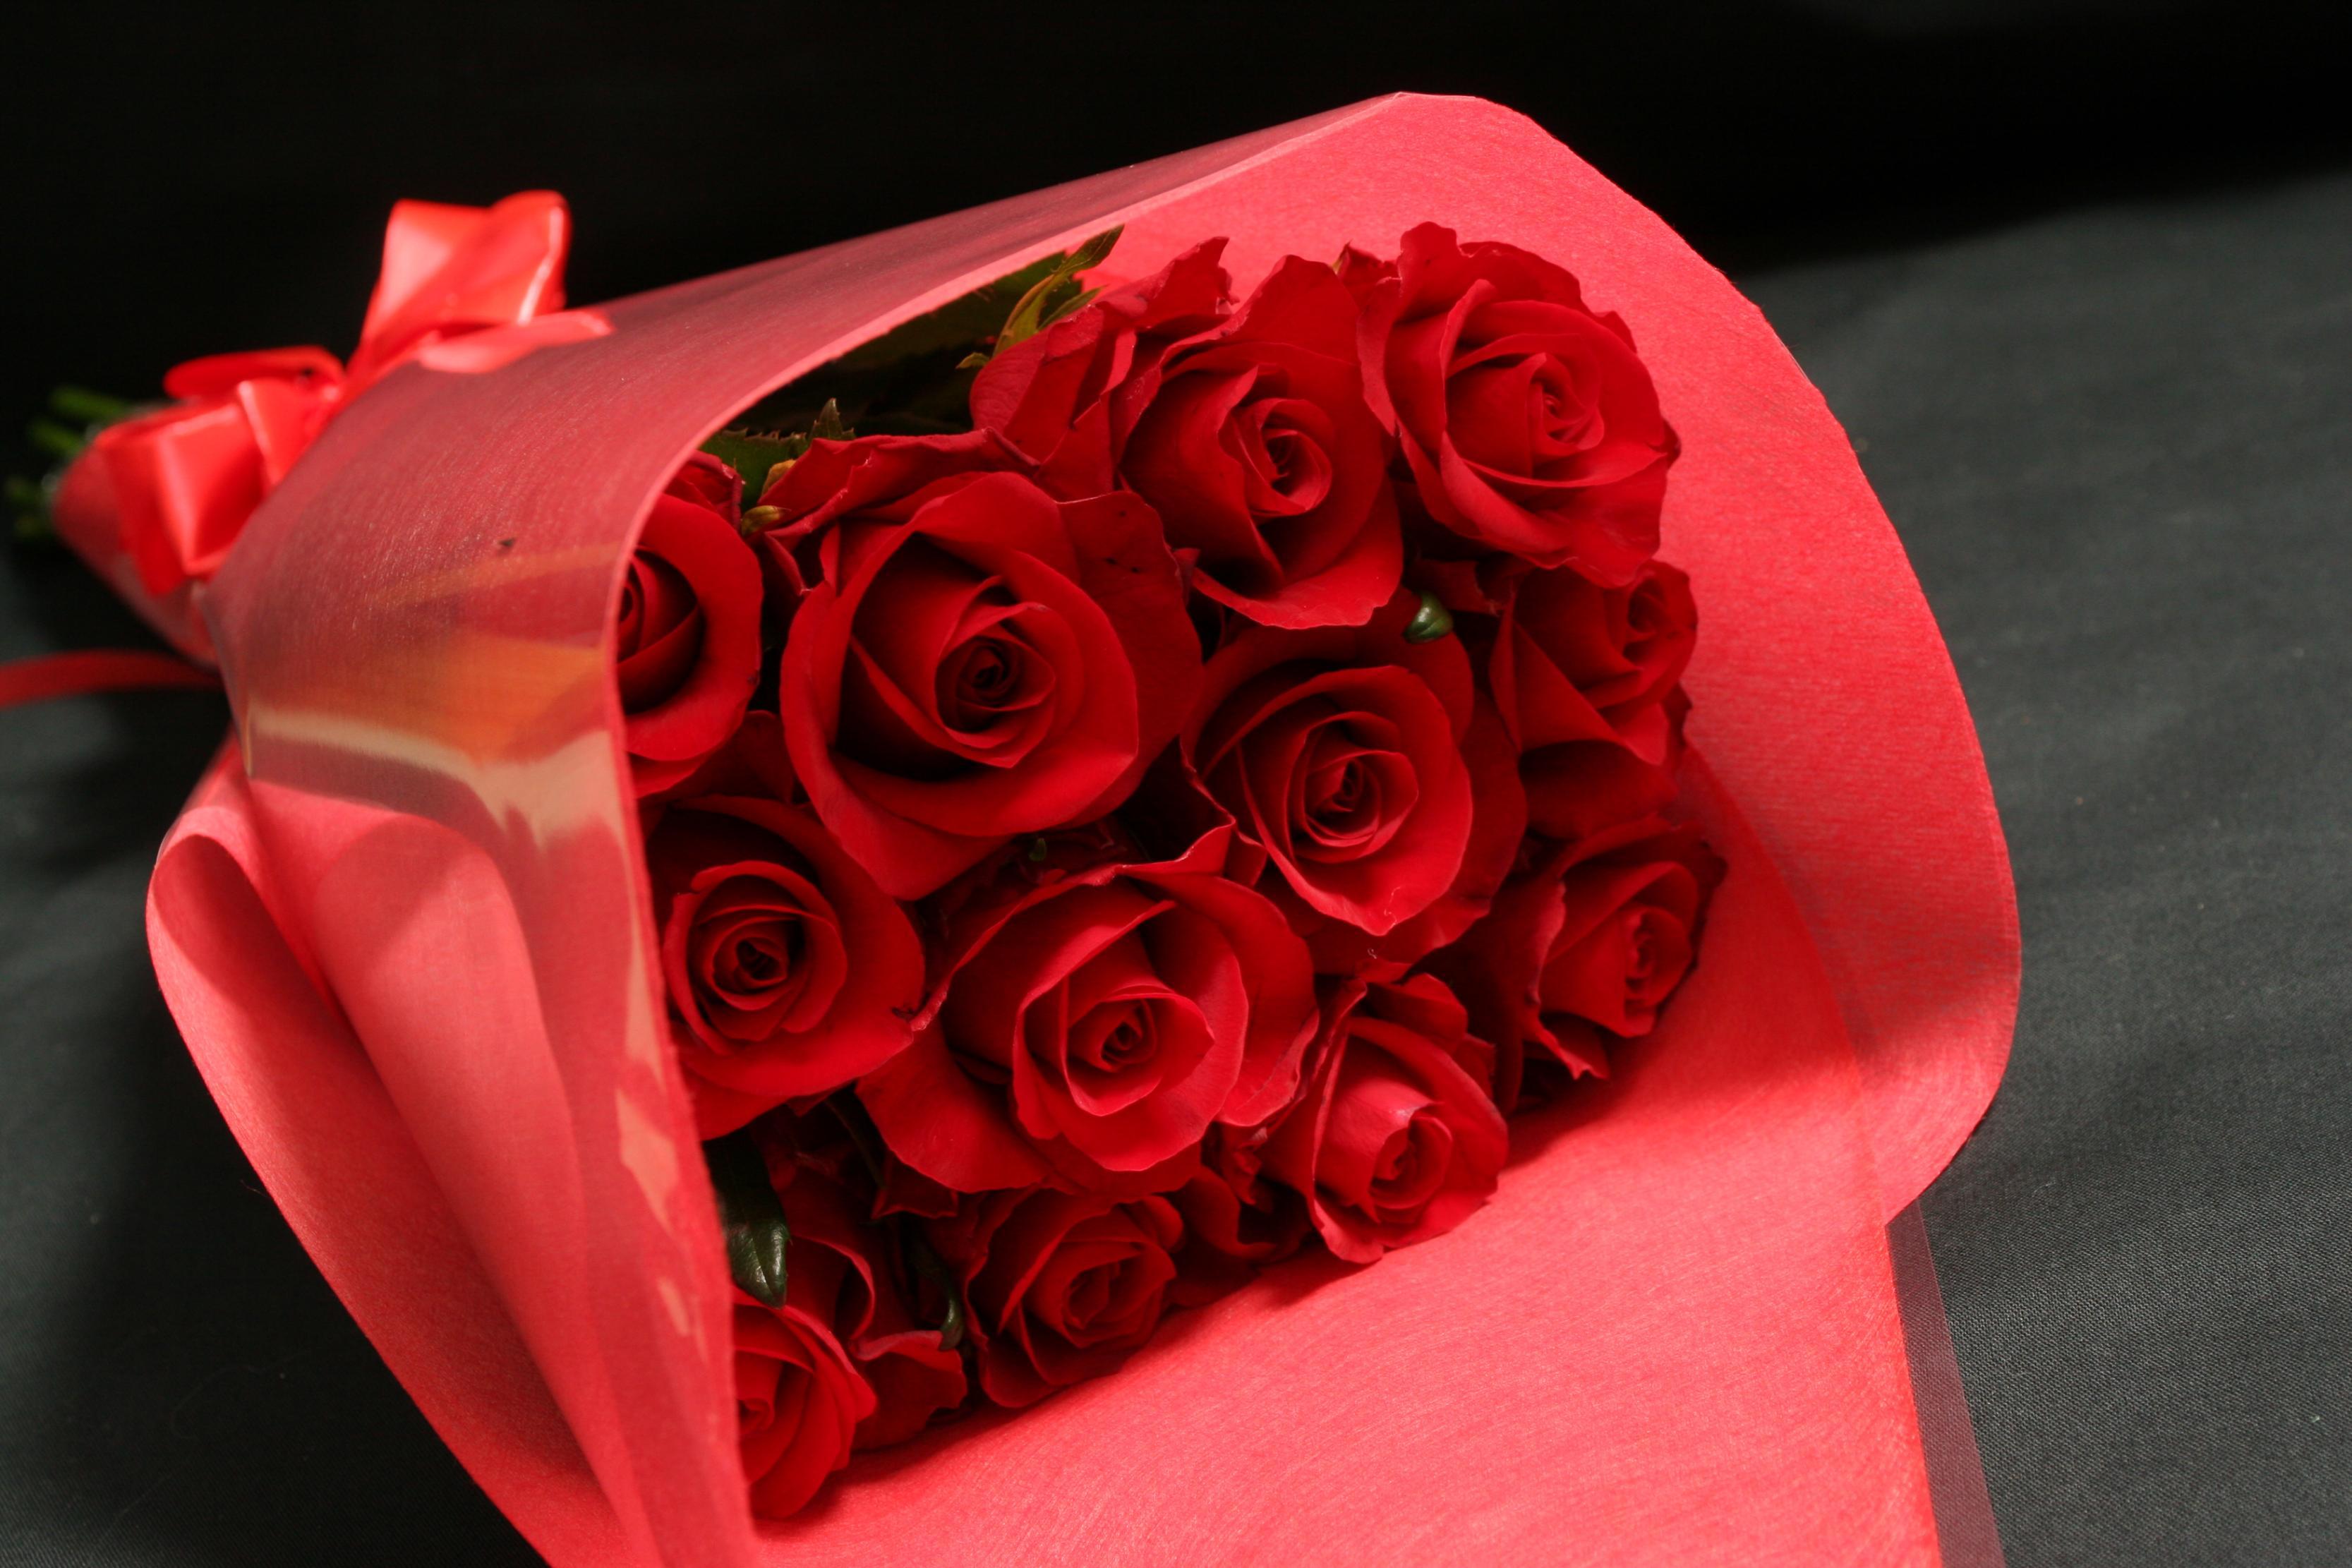 بالصور صور اجمل ورد , اجمل صور لبوكيهات الورد 3493 11